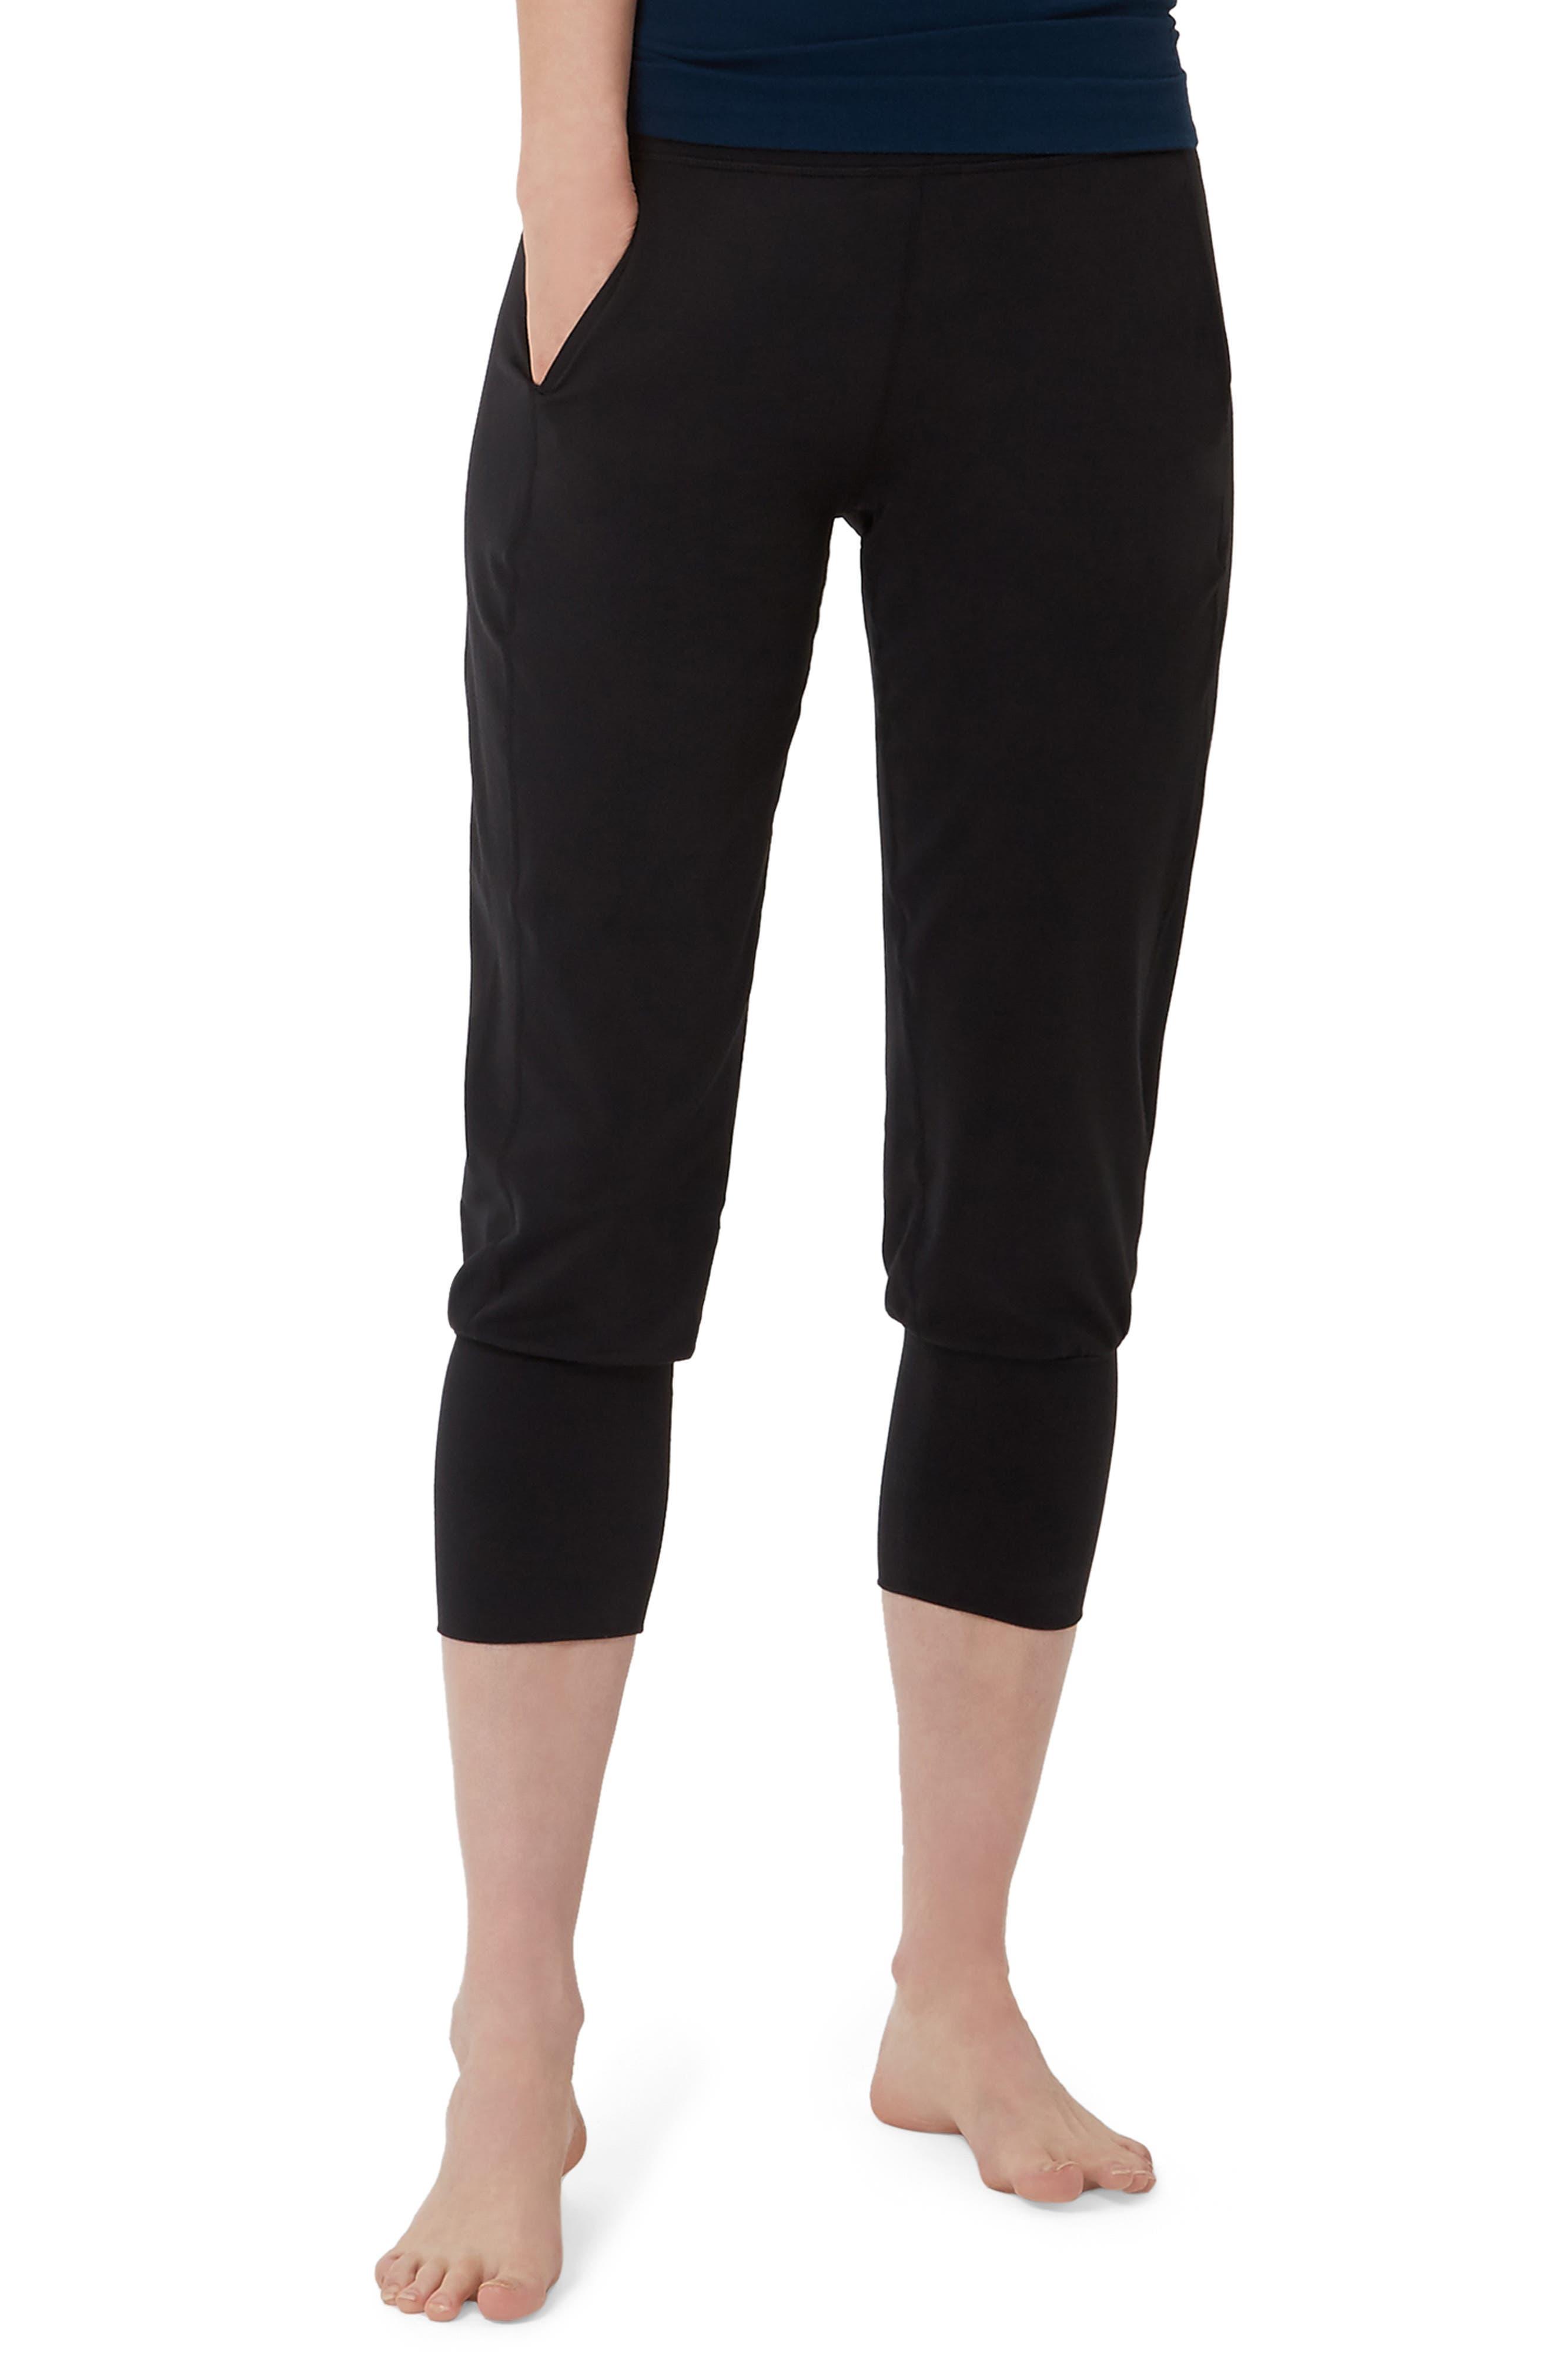 SWEATY BETTY Garudasana Crop Yoga Trousers, Main, color, BLACK